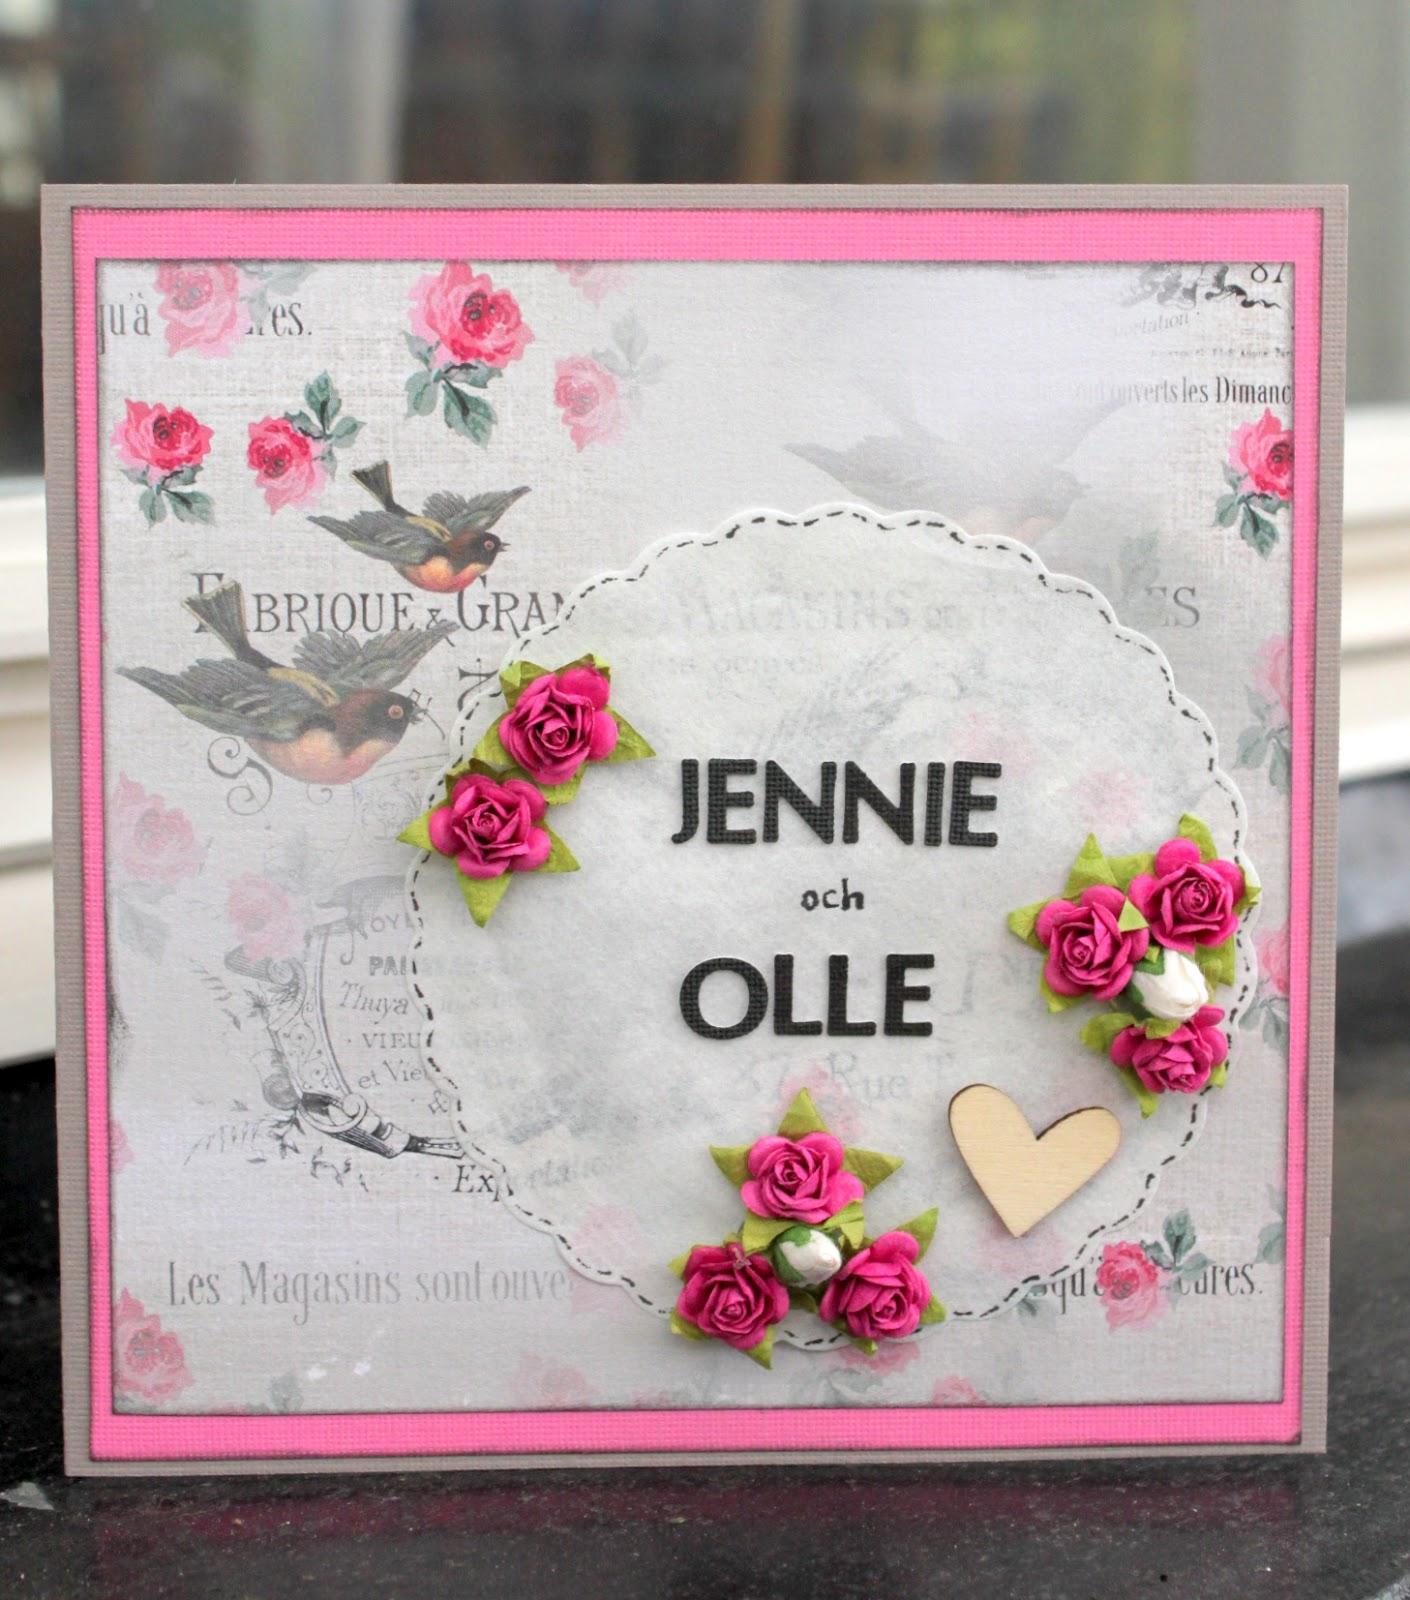 grattis bröllopskort hemma hos ulrika: Bröllopskort   grattis till Jennie och Olle grattis bröllopskort